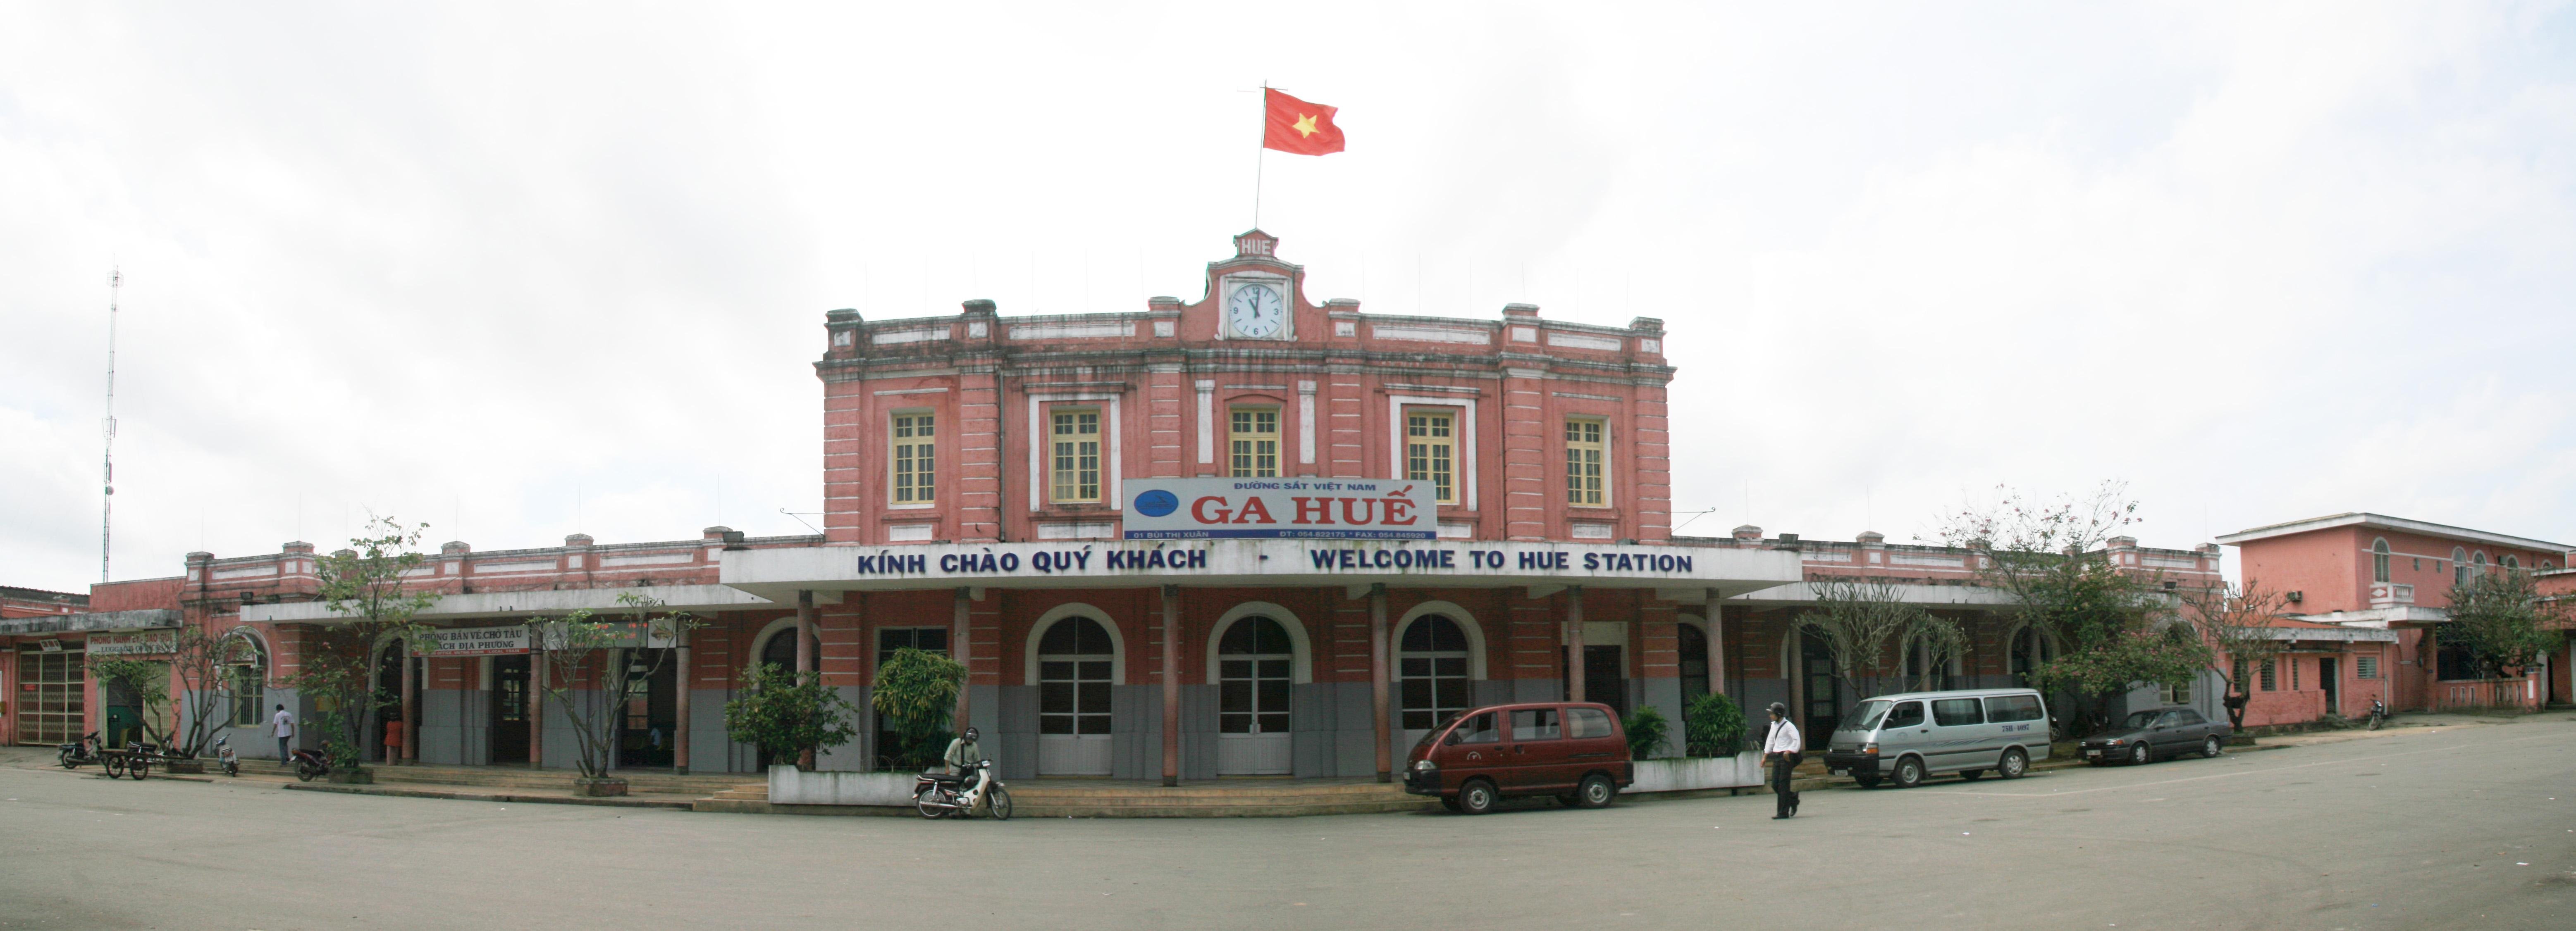 Gare de Hué